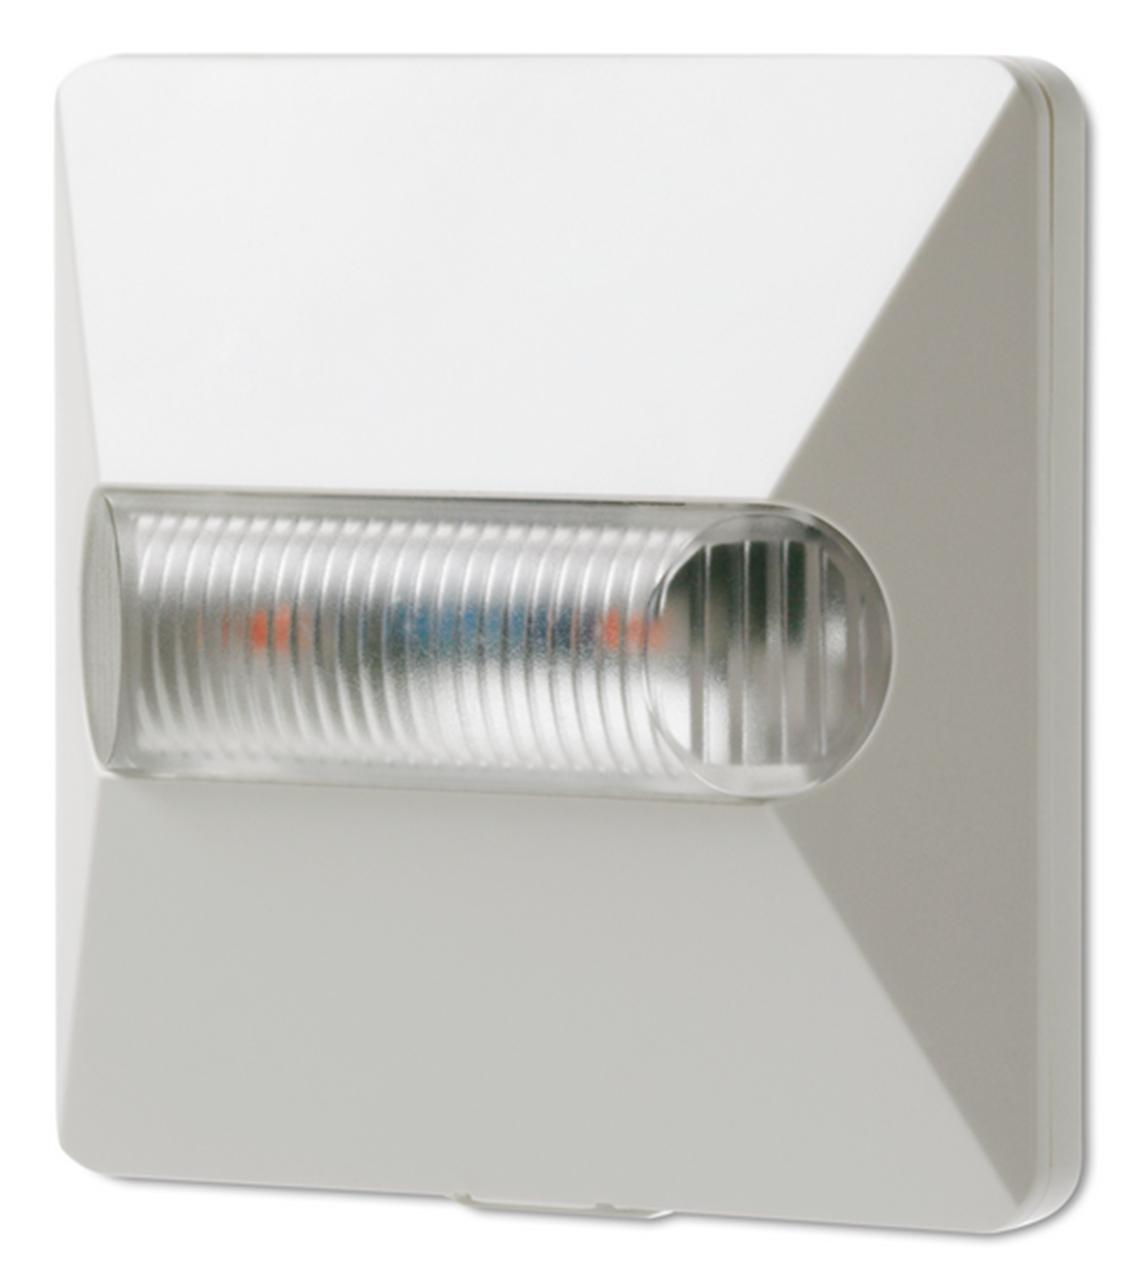 Bentel security RILED - Remote LED Indicator Armenia Vantag